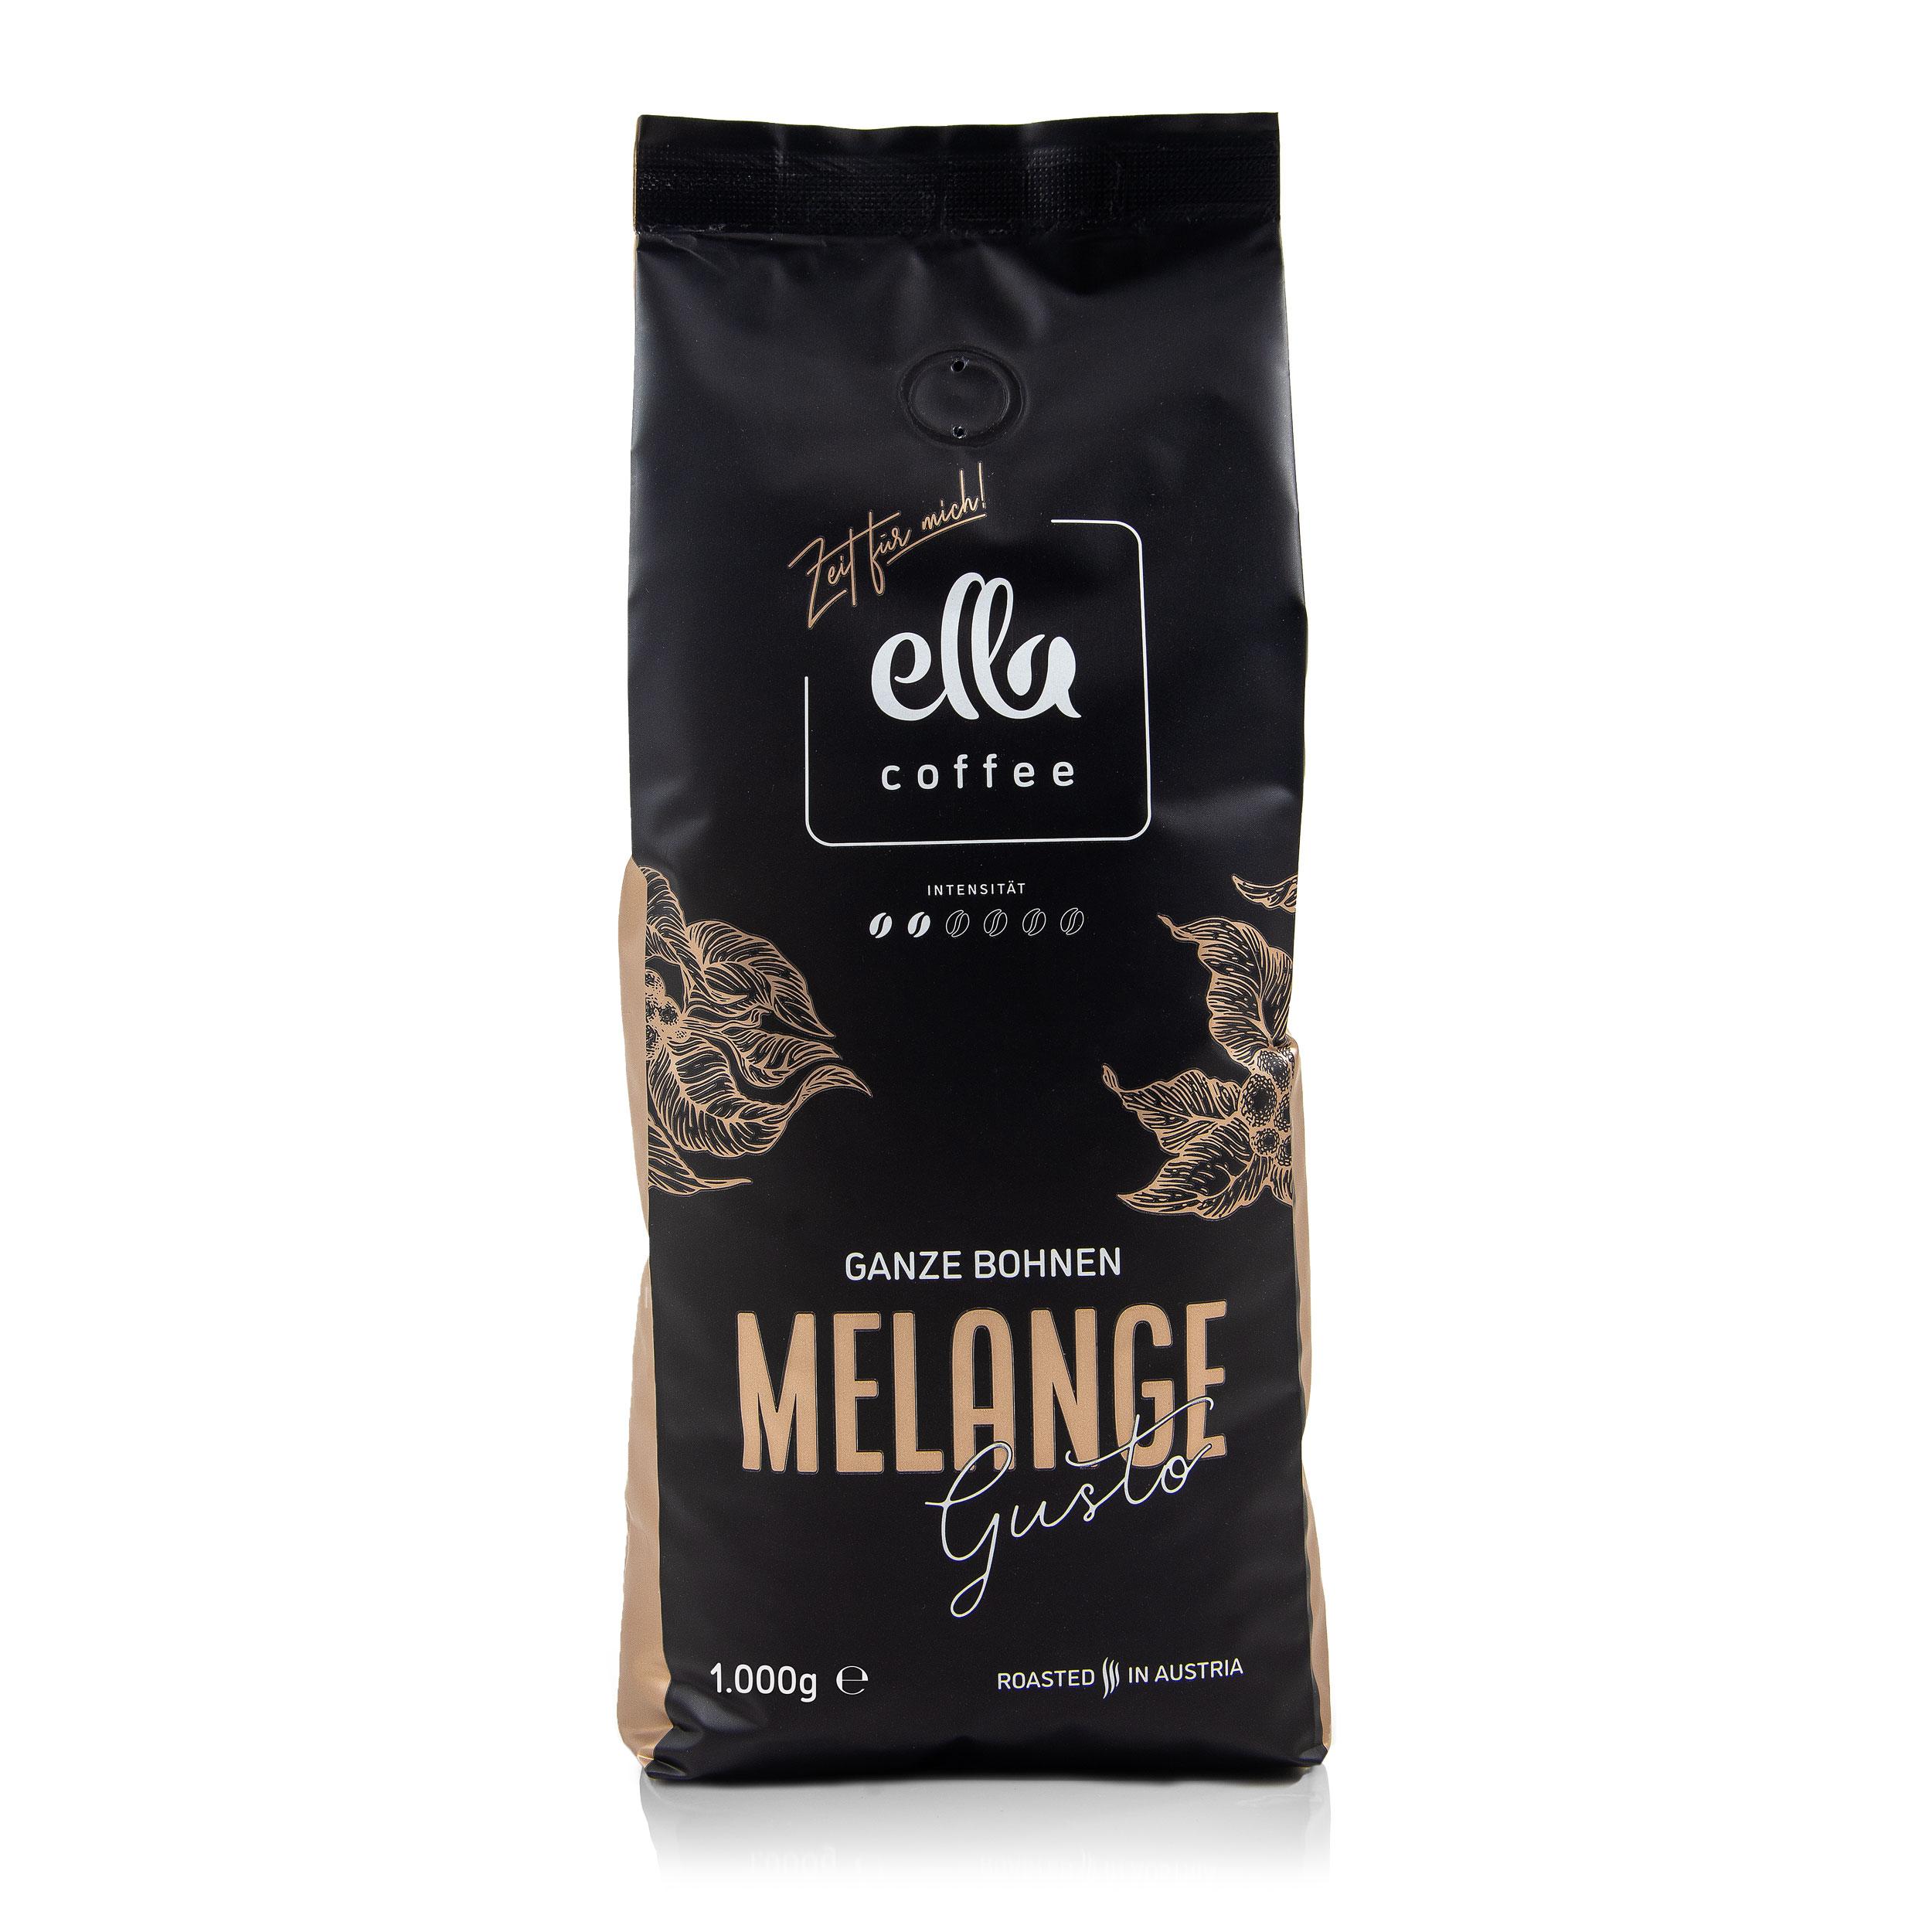 Melange Gusto Ella Coffee